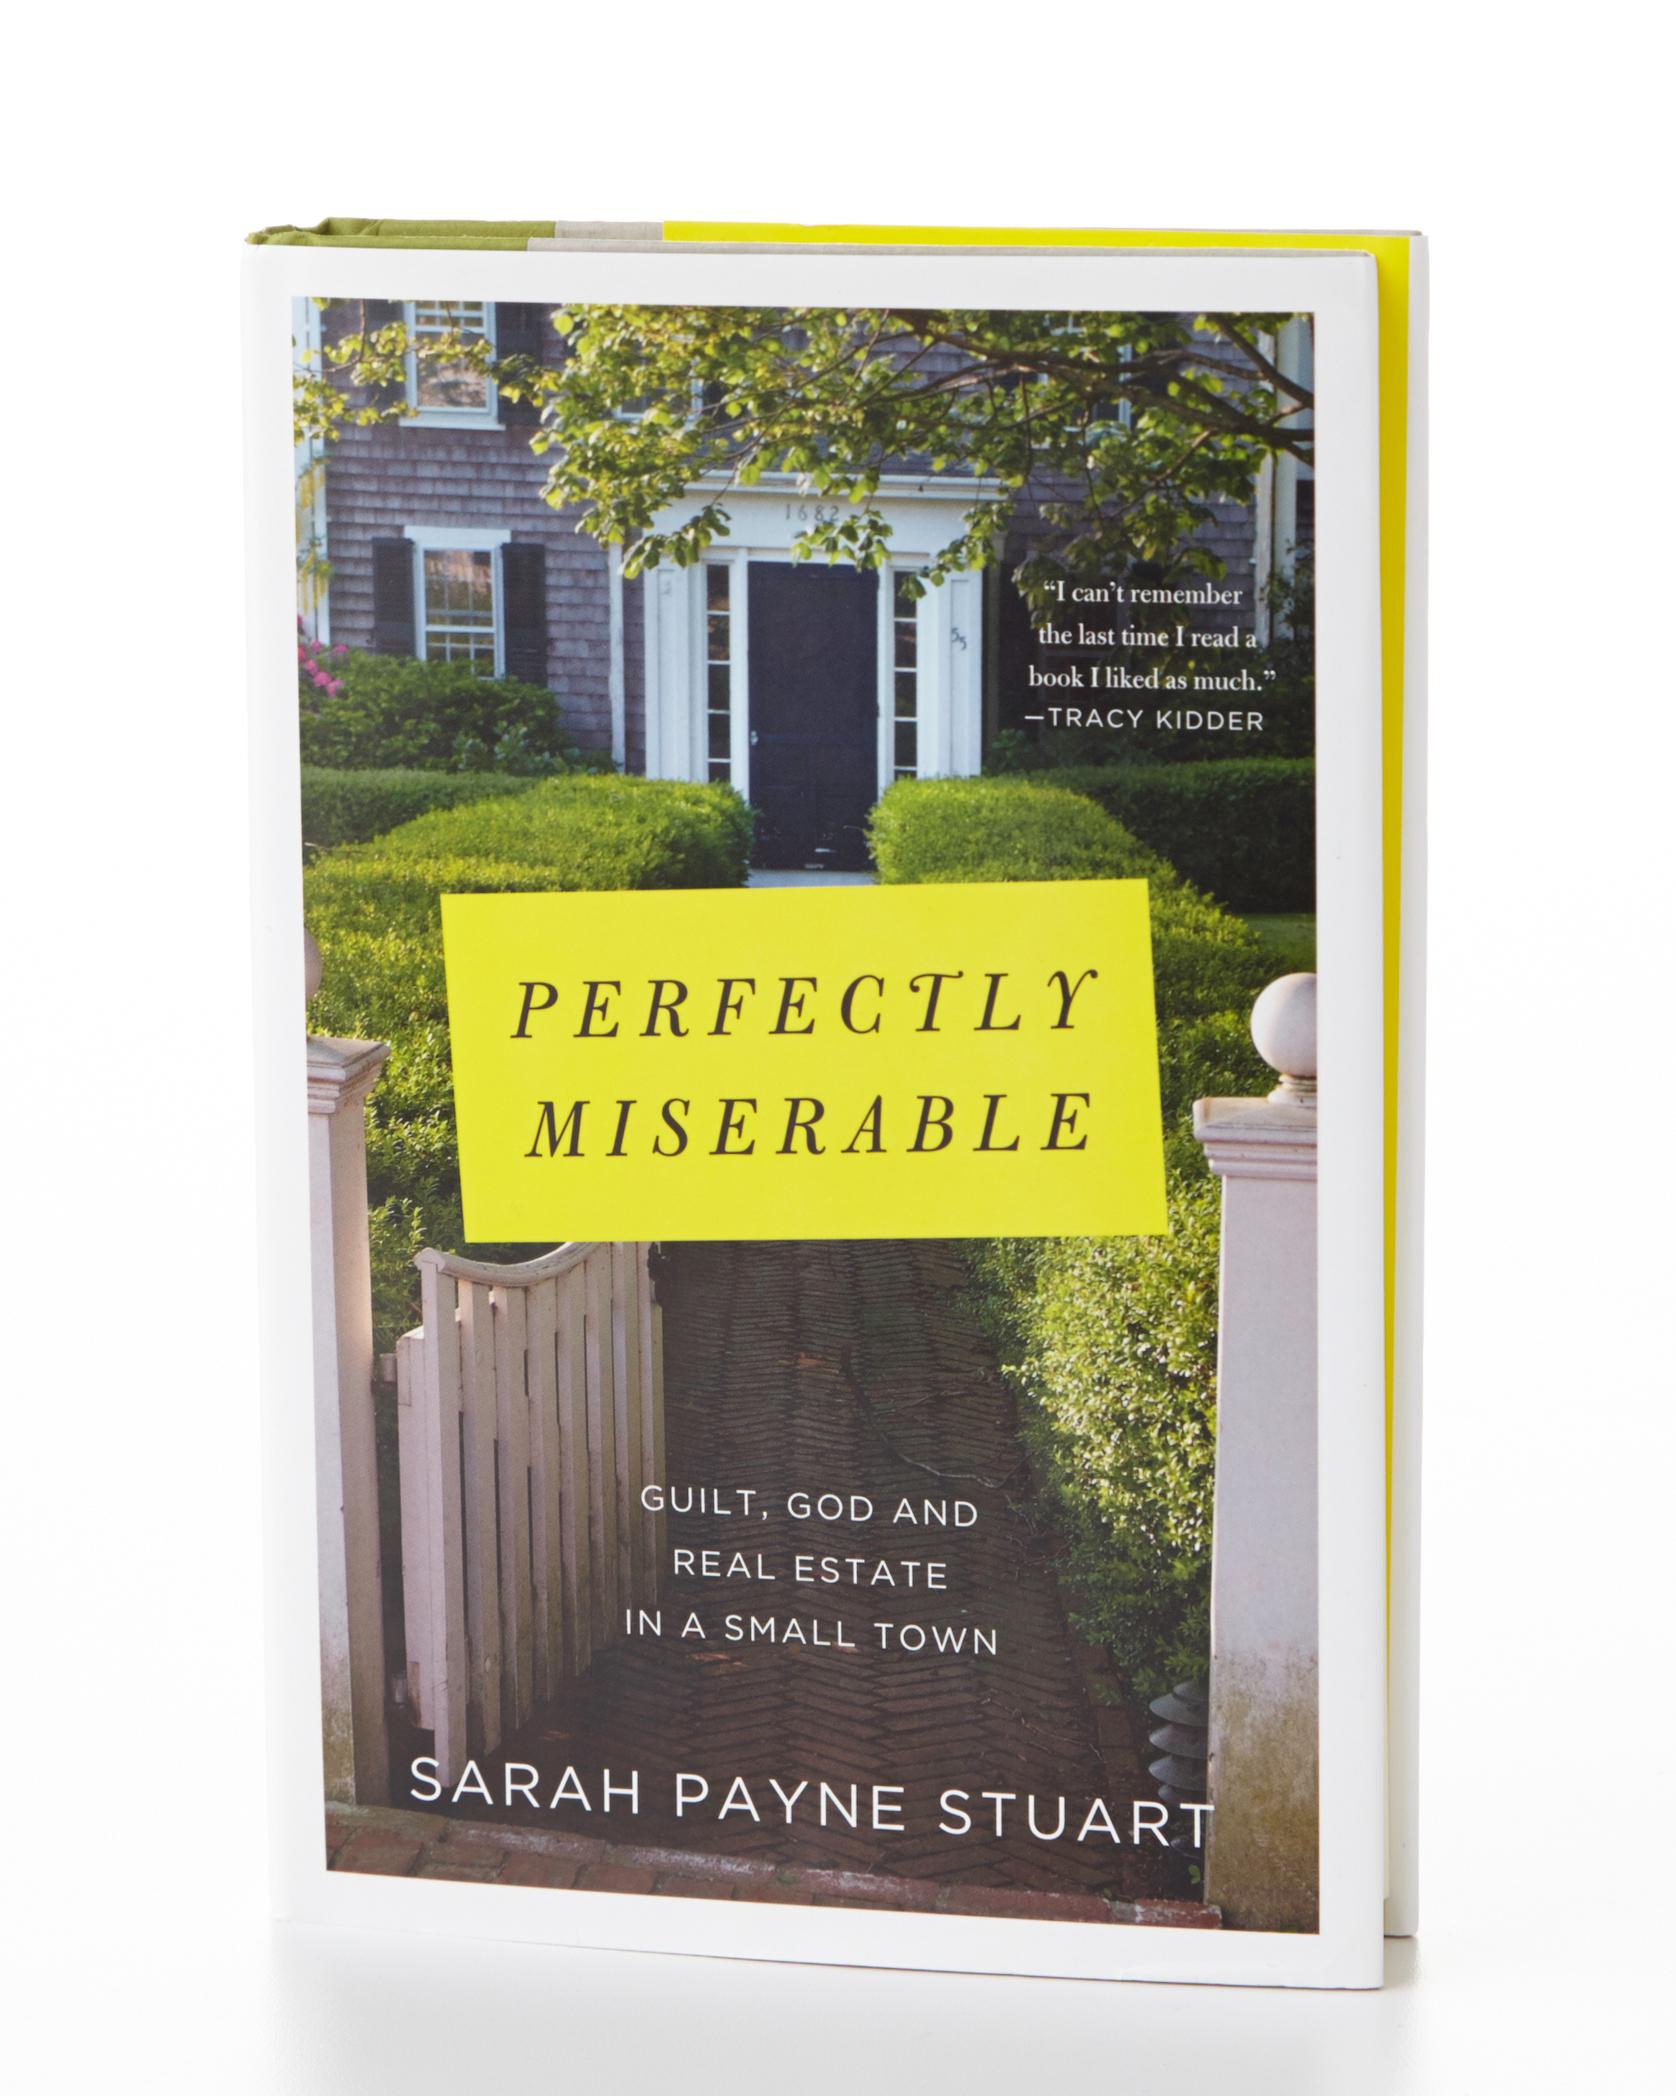 honeymoon-book-ideas-sarah-payne-stuart-0614.jpg